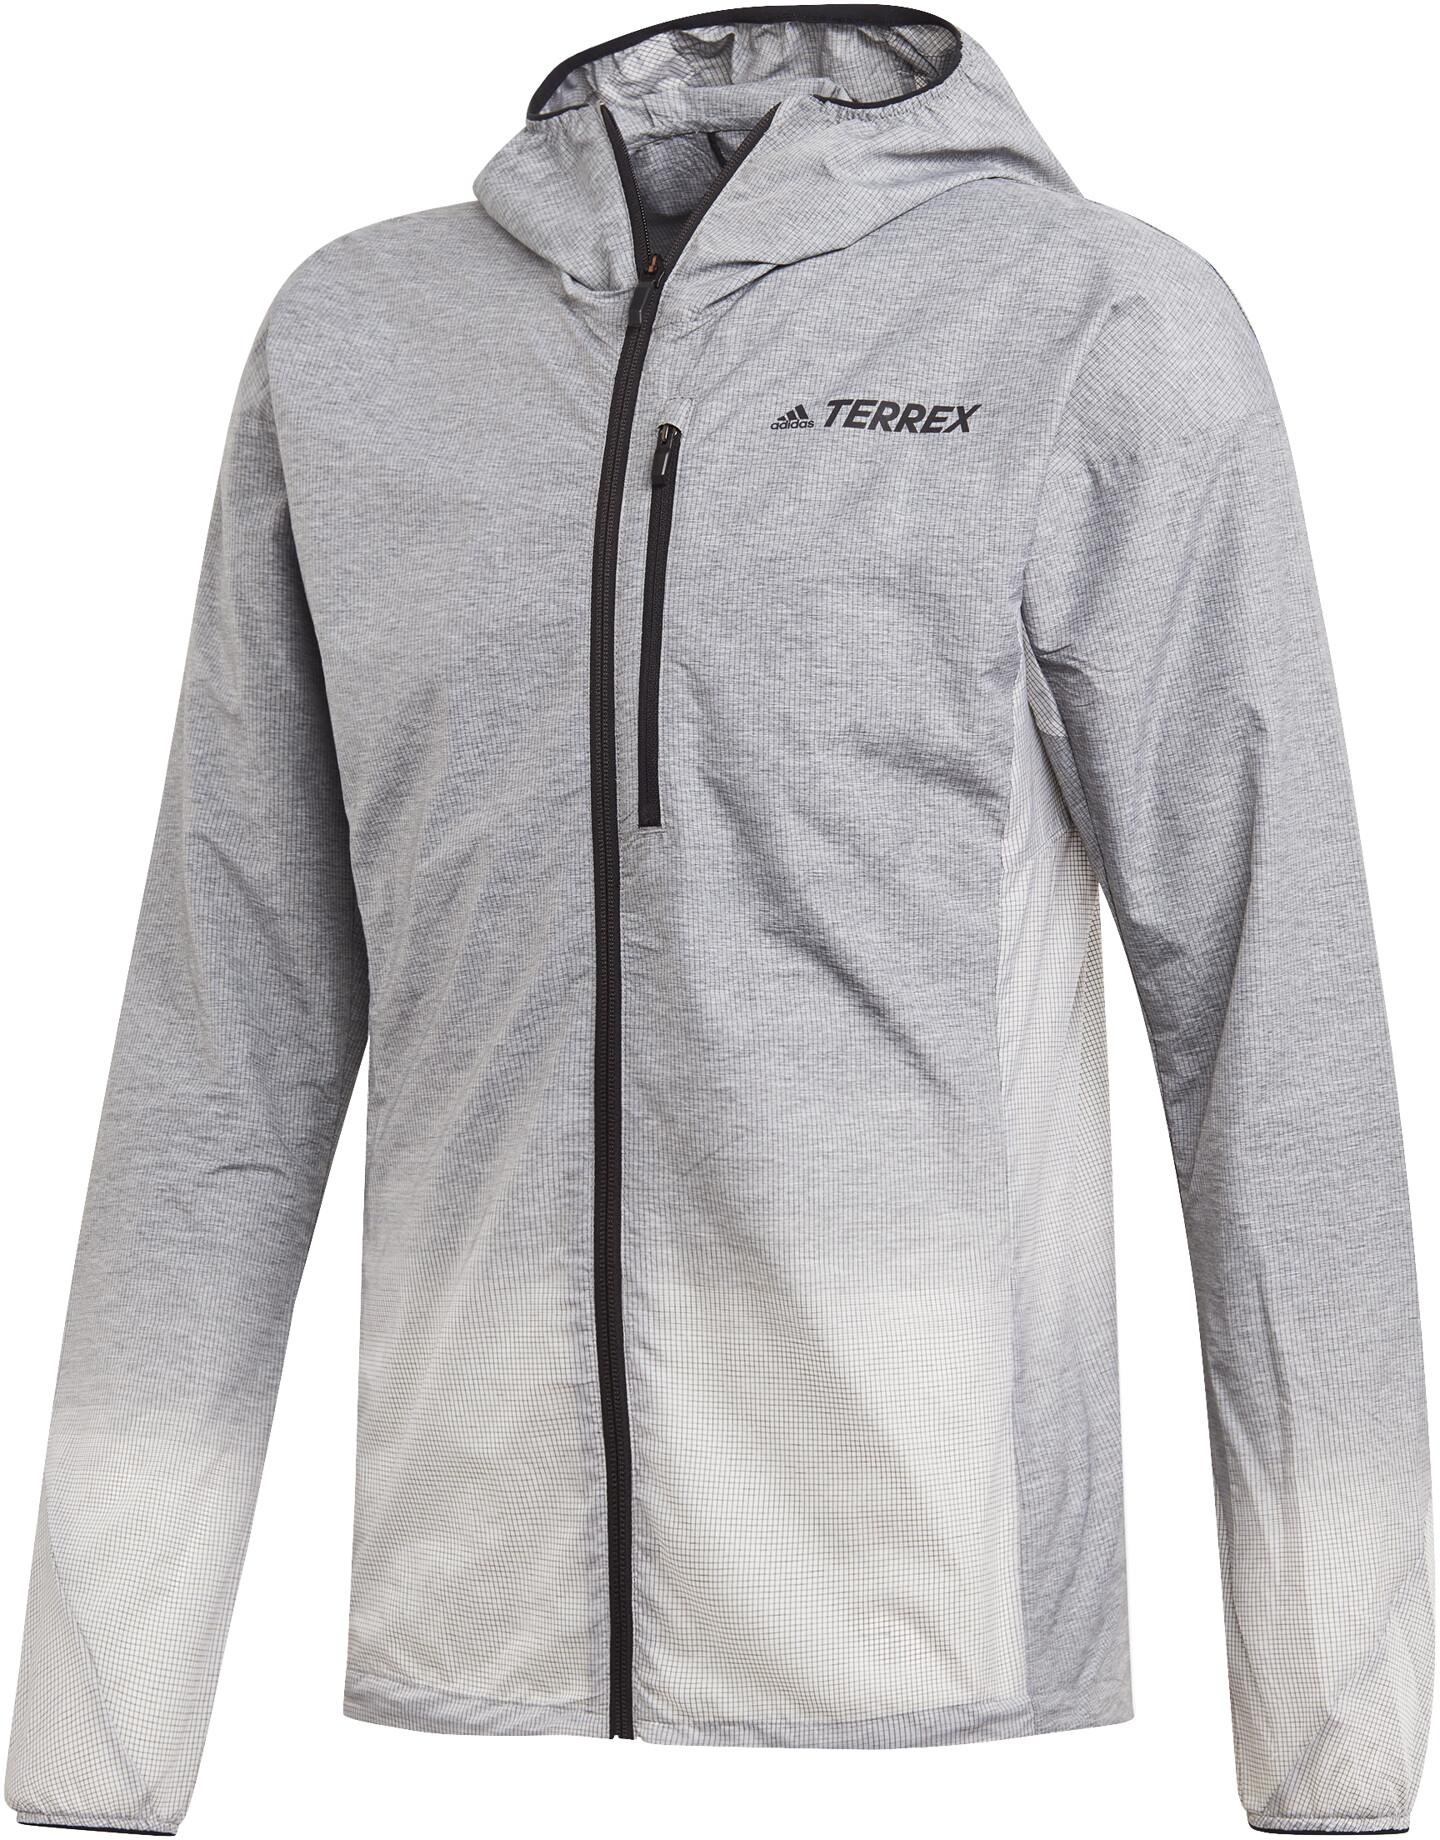 adidas TERREX Agravic Windweave Jacket Men grey fourwhite